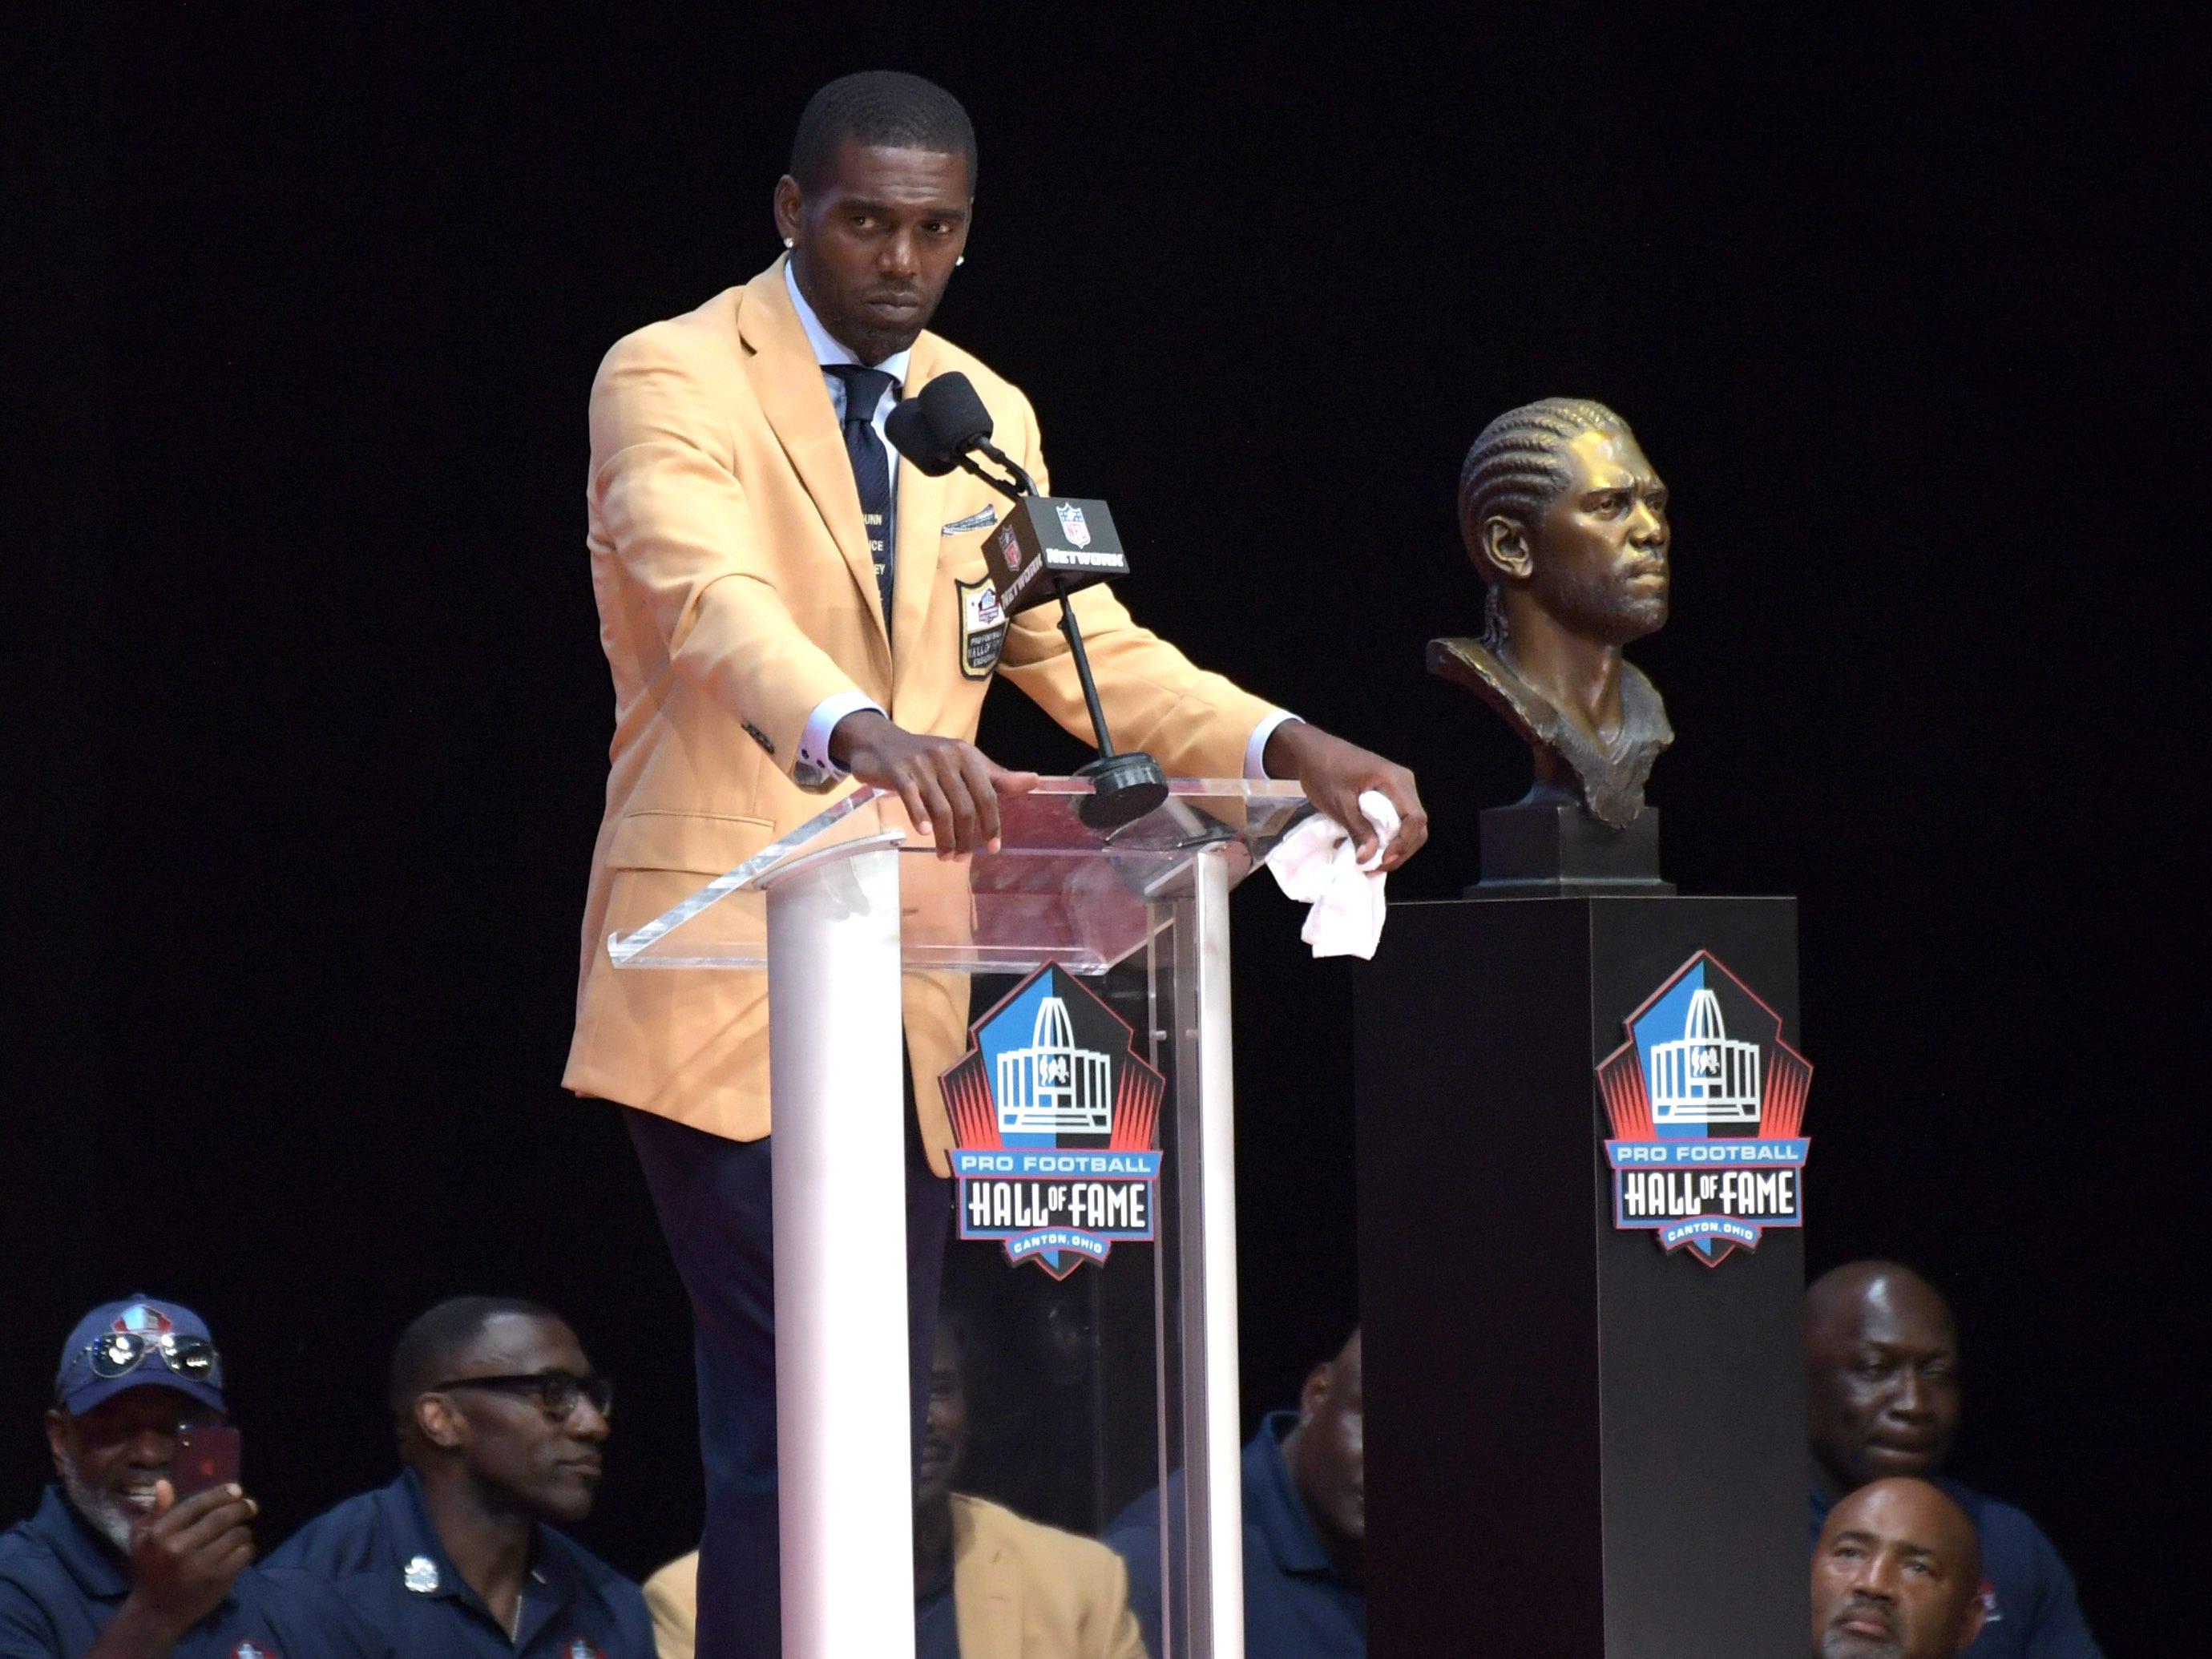 Randy Moss speaks during the Pro Football Hall of Fame Enshrinement Ceremony at Tom Bensen Stadium.